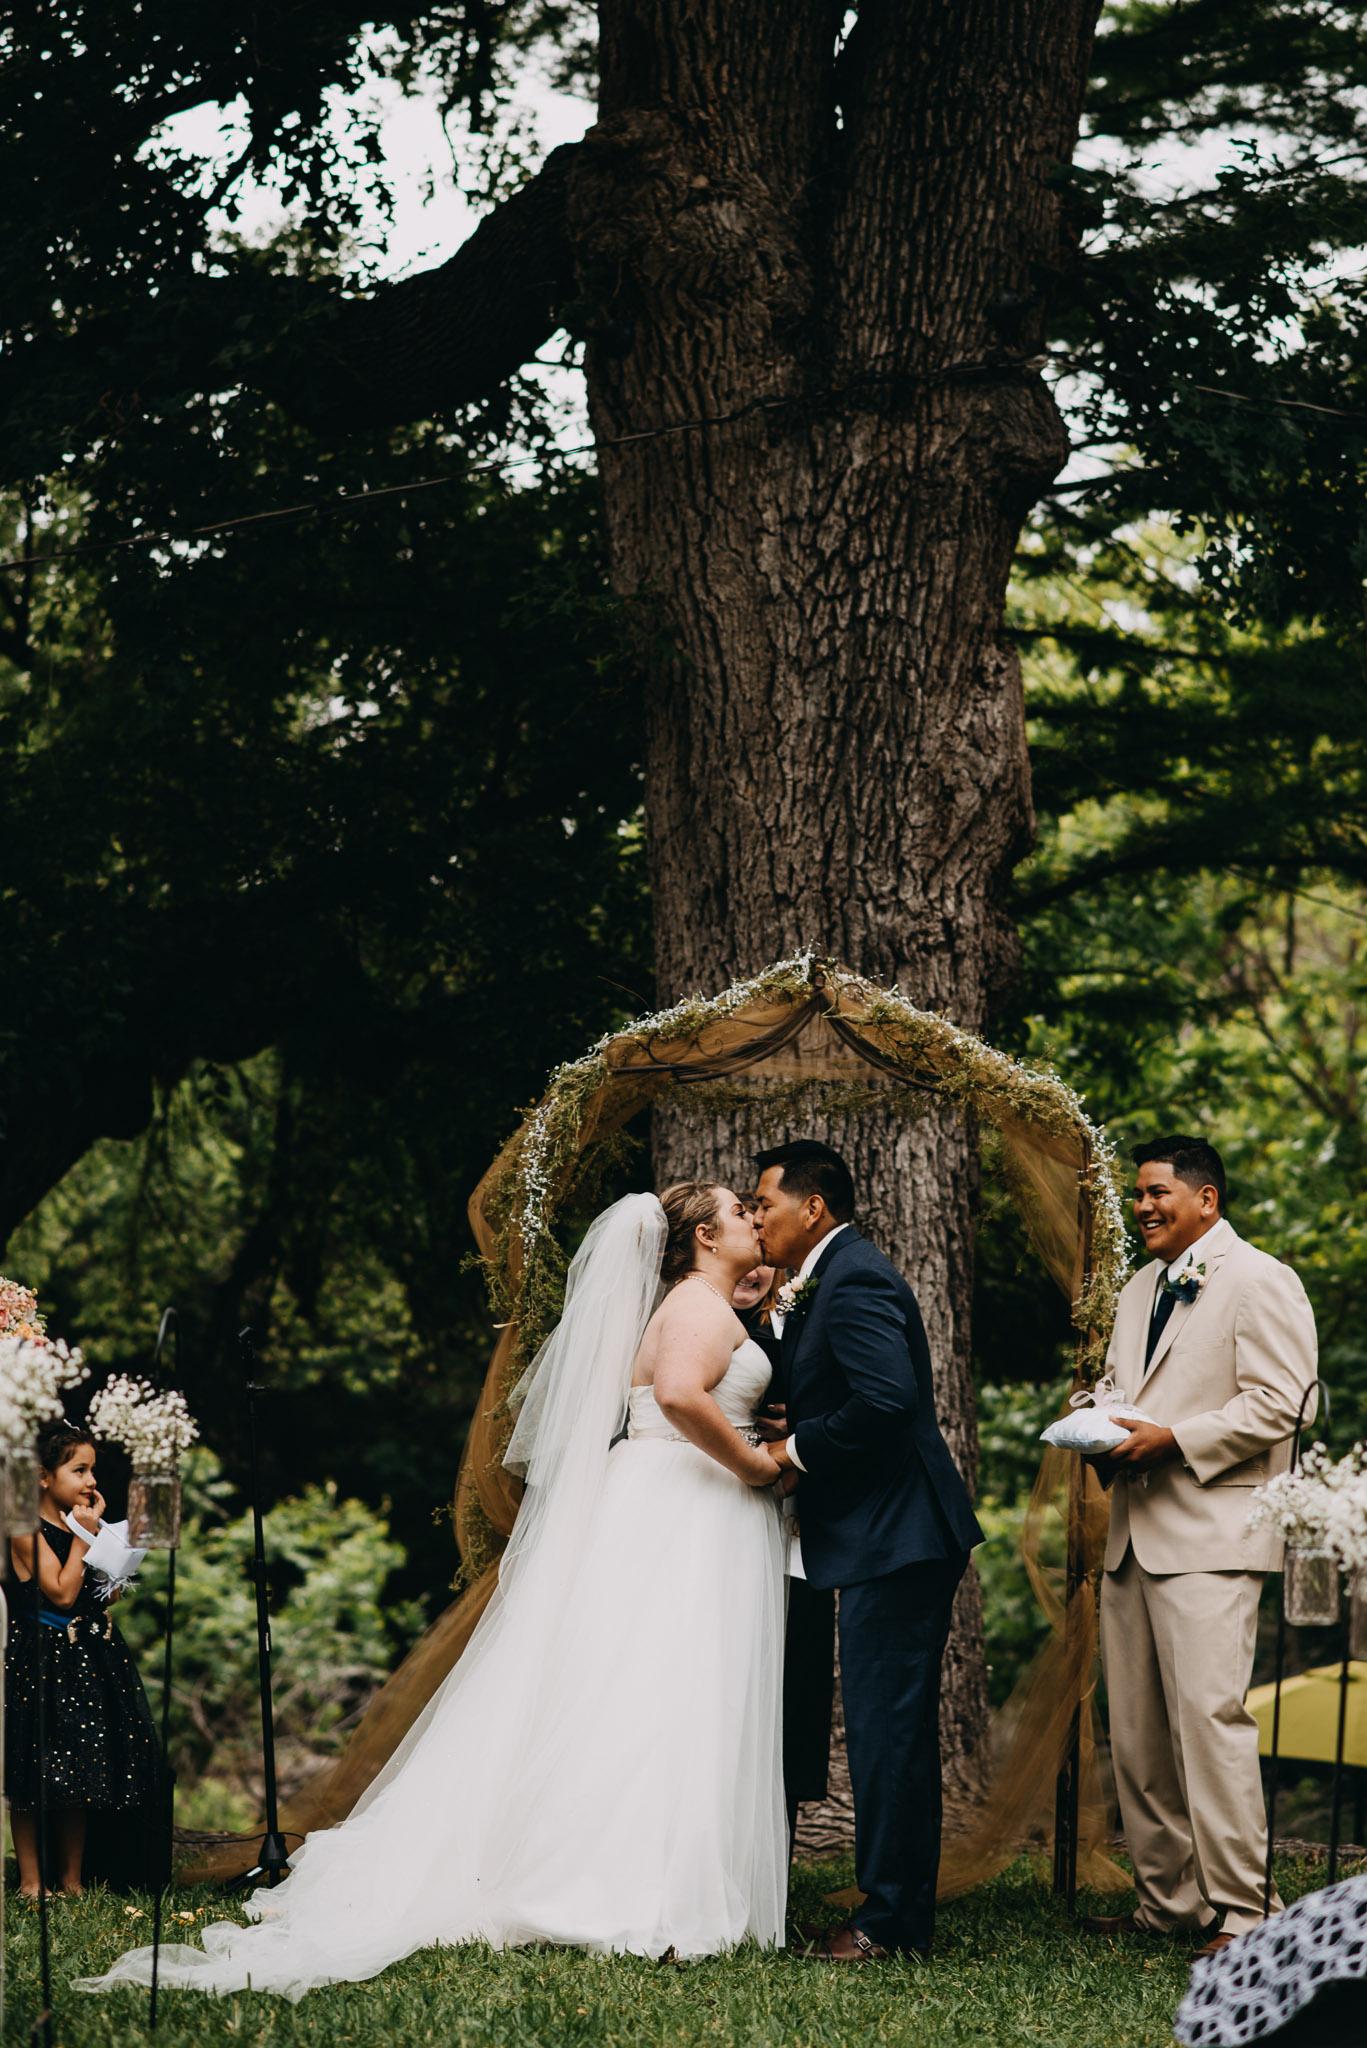 Christoval-Texas-Wedding_Photographer-Meghan&Tony-0016.jpg